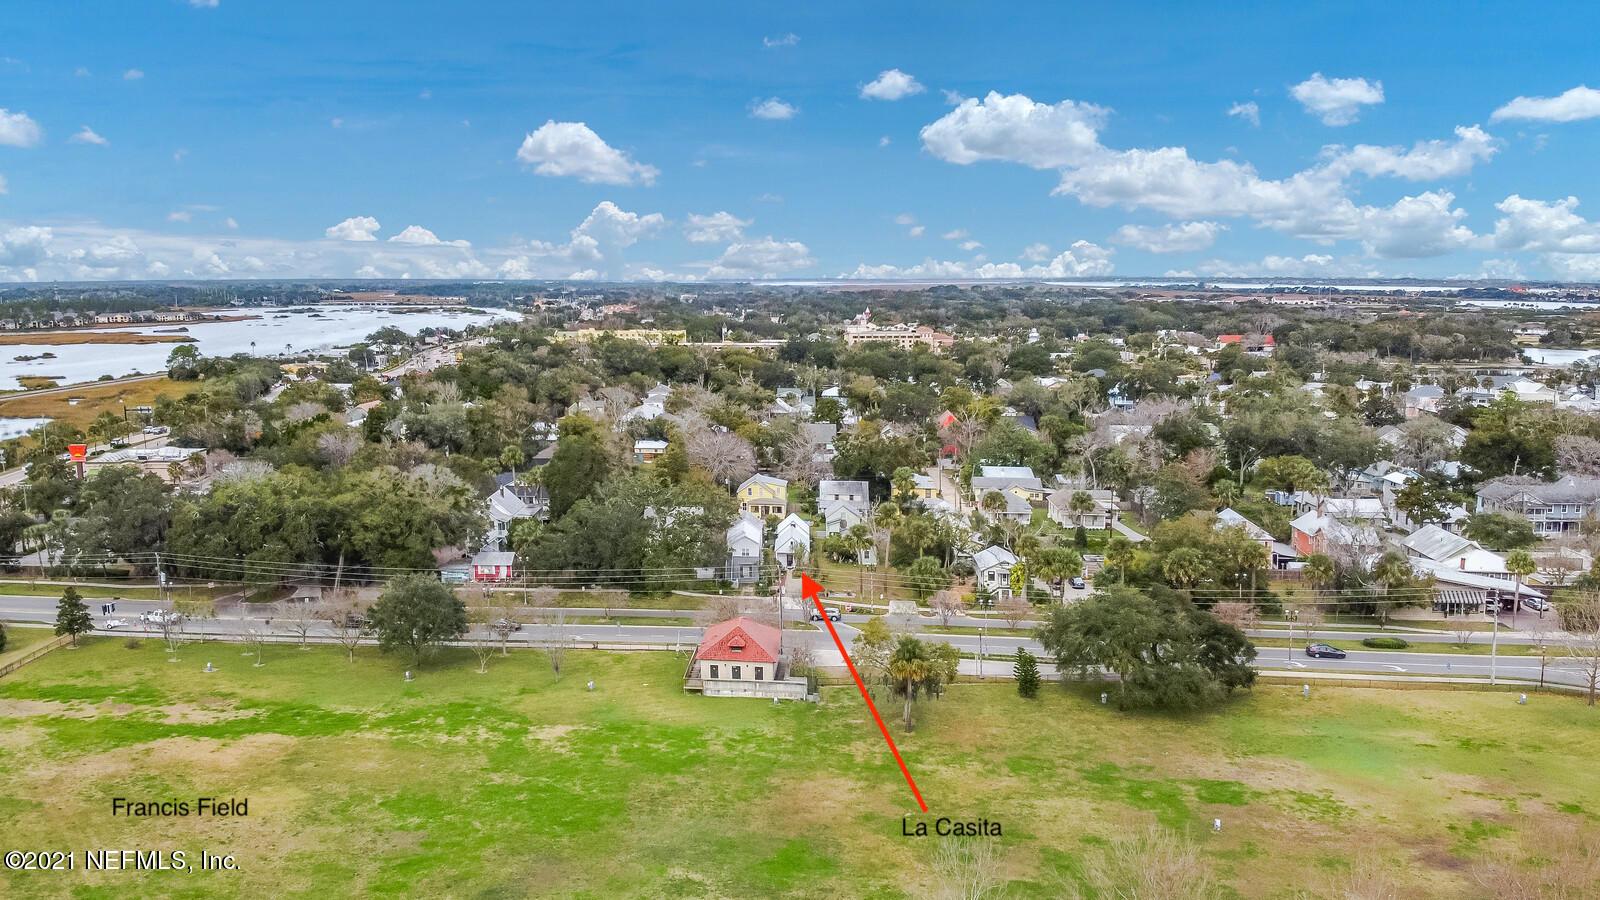 39 GROVE, ST AUGUSTINE, FLORIDA 32084, 2 Bedrooms Bedrooms, ,2 BathroomsBathrooms,Residential,For sale,GROVE,1091270